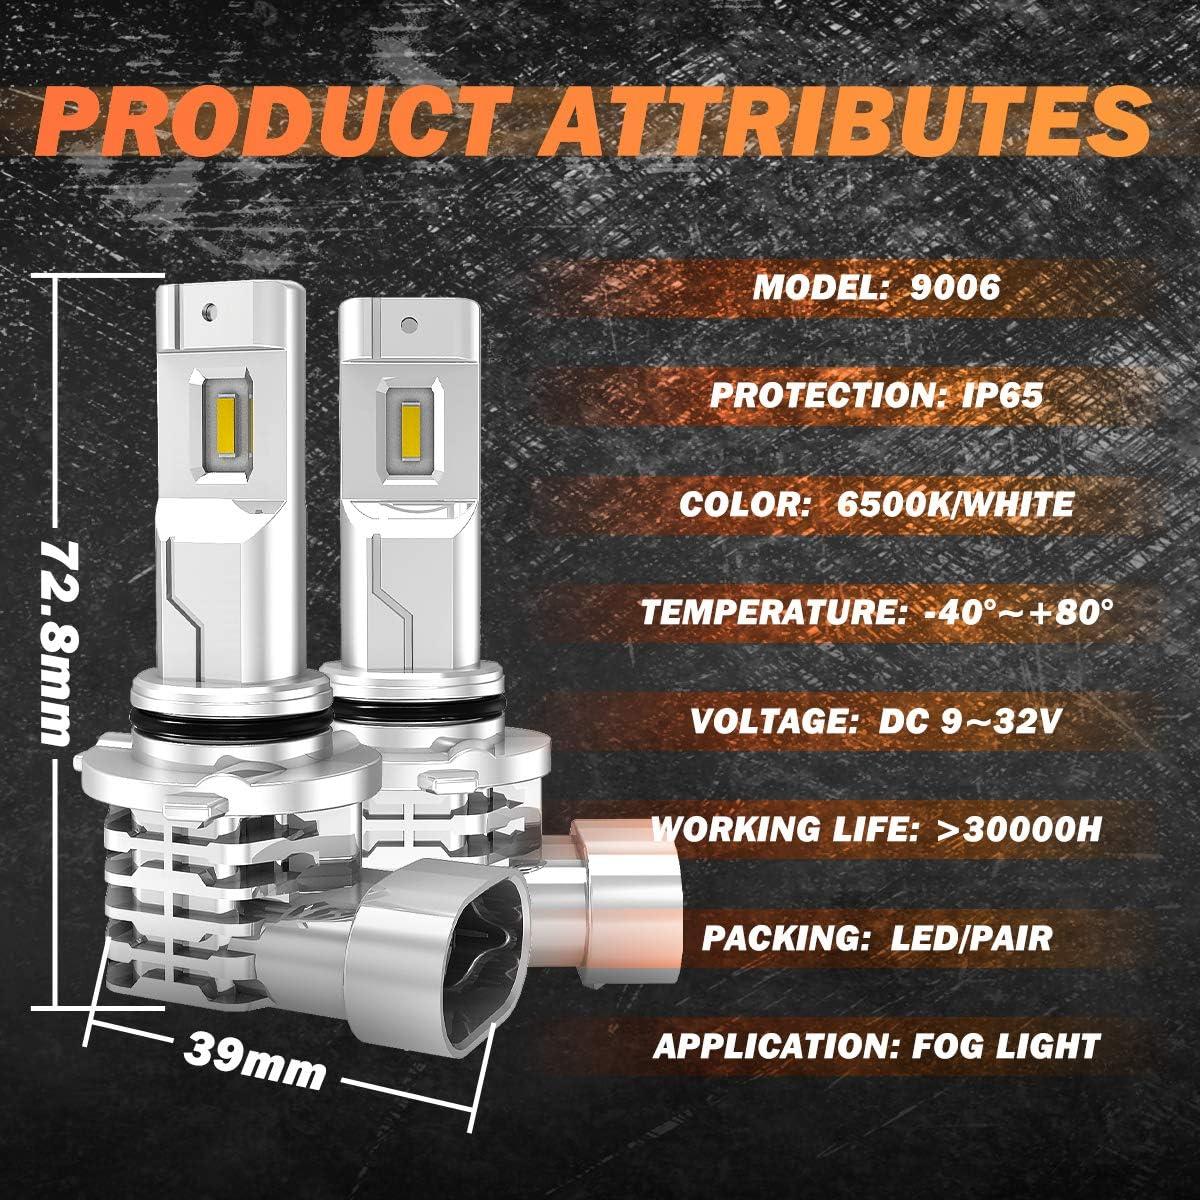 Pack of 2 32V 2 Yr Warranty NATGIC HB4 9006 LED Fog Light Bulbs Hight Power 55W Super Bright CSP Chips Replacement for Daytime Running Light Driving Lamp 3200LM /& 6500K Xenon White DC 9V